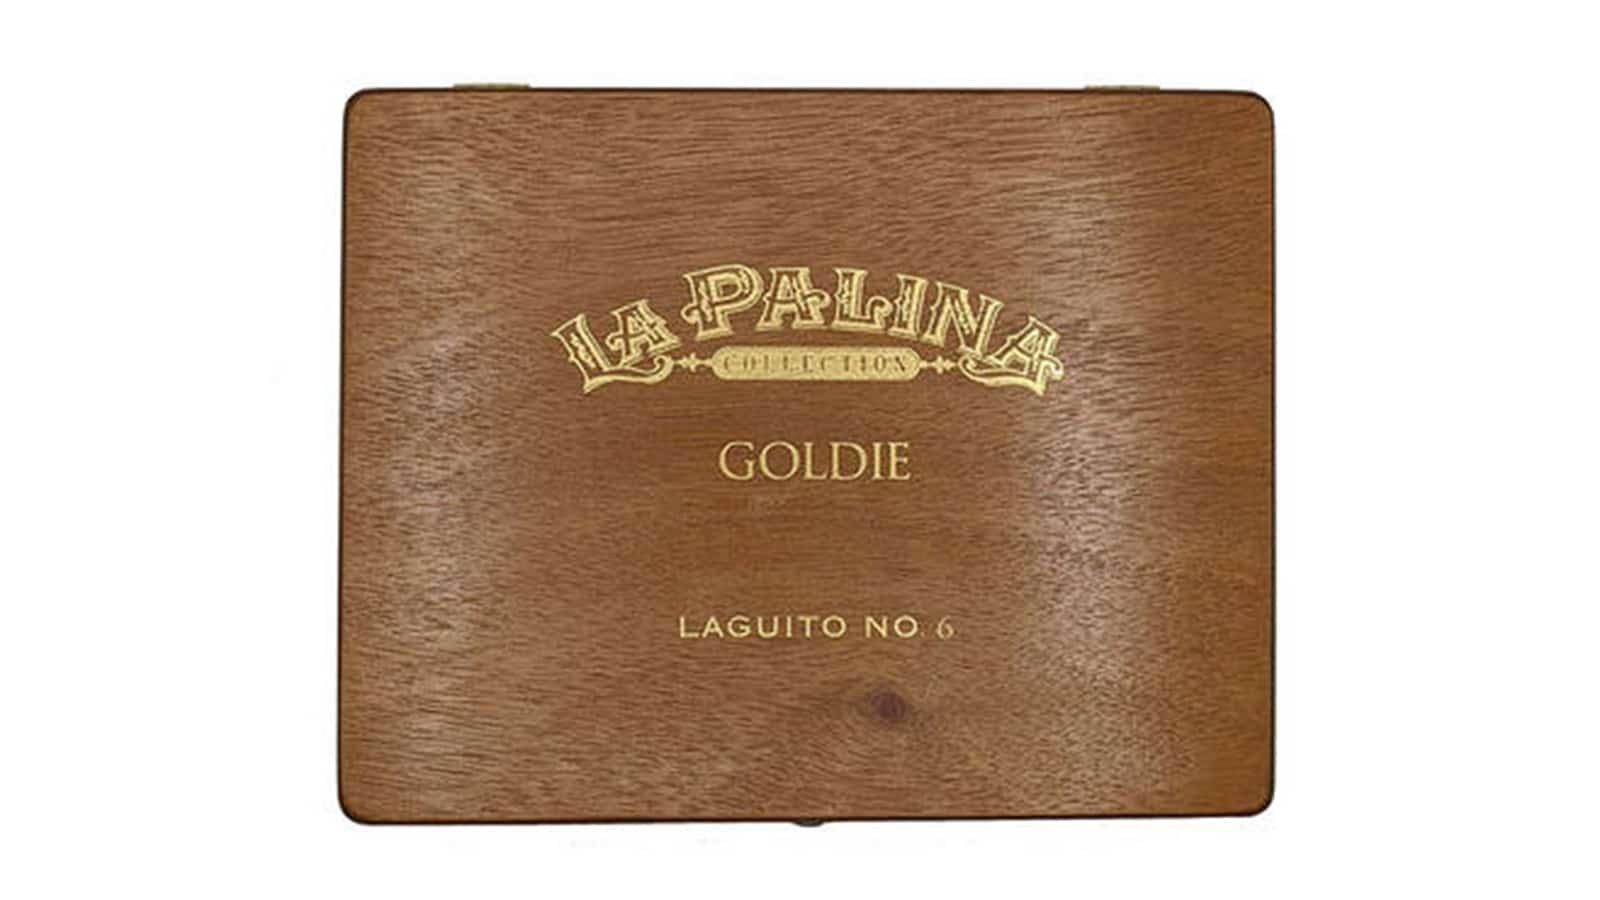 La Palina Goldie Laguito No.6